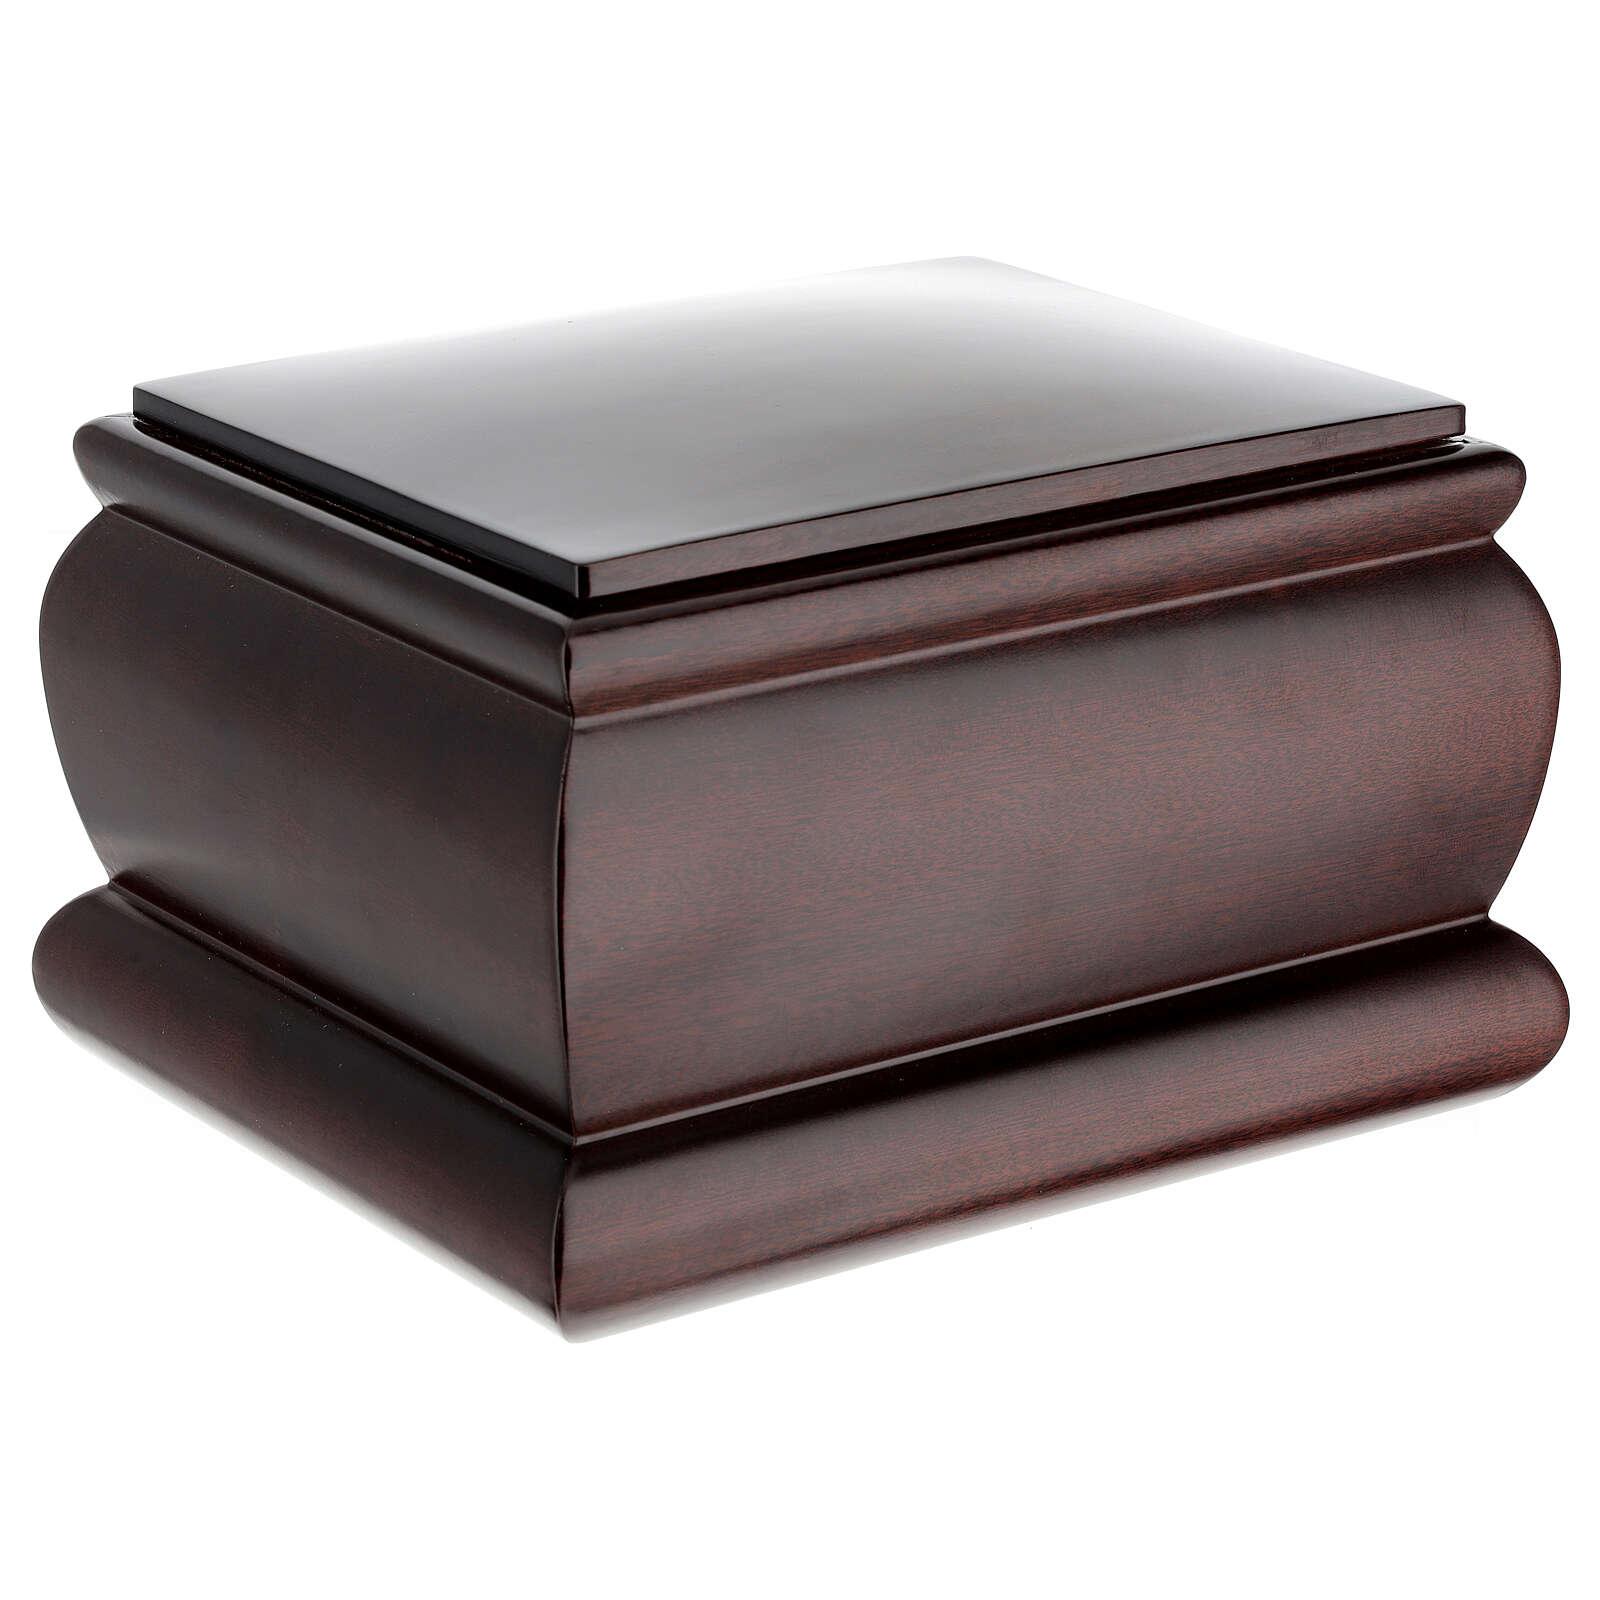 Urna funeraria Cofre caoba barnizada 3